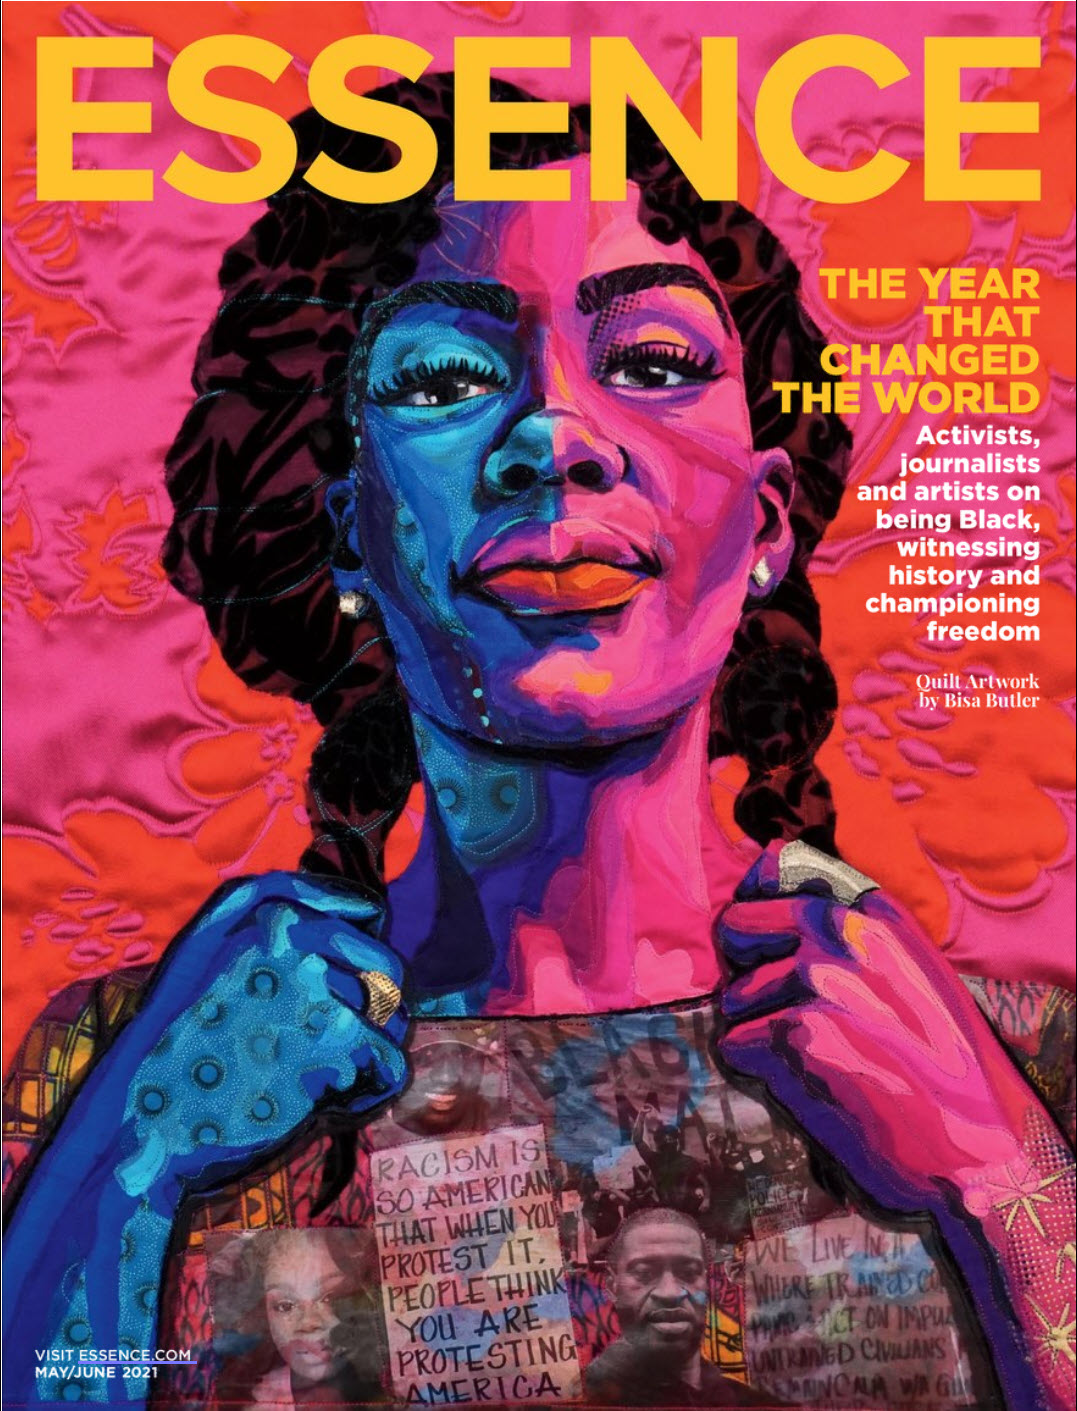 Essence Magazine May/June 2021